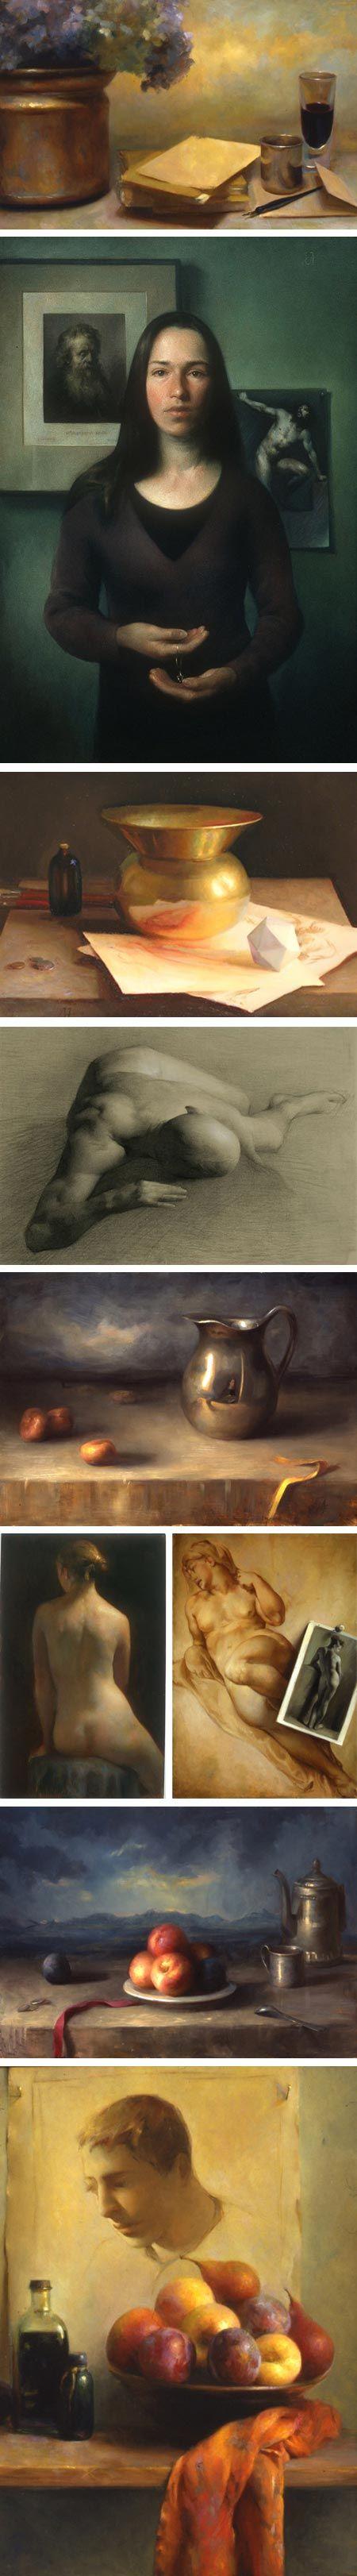 Juliette Aristides. My favorite contemporary realist artist & teacher. http://www.aristidesarts.com